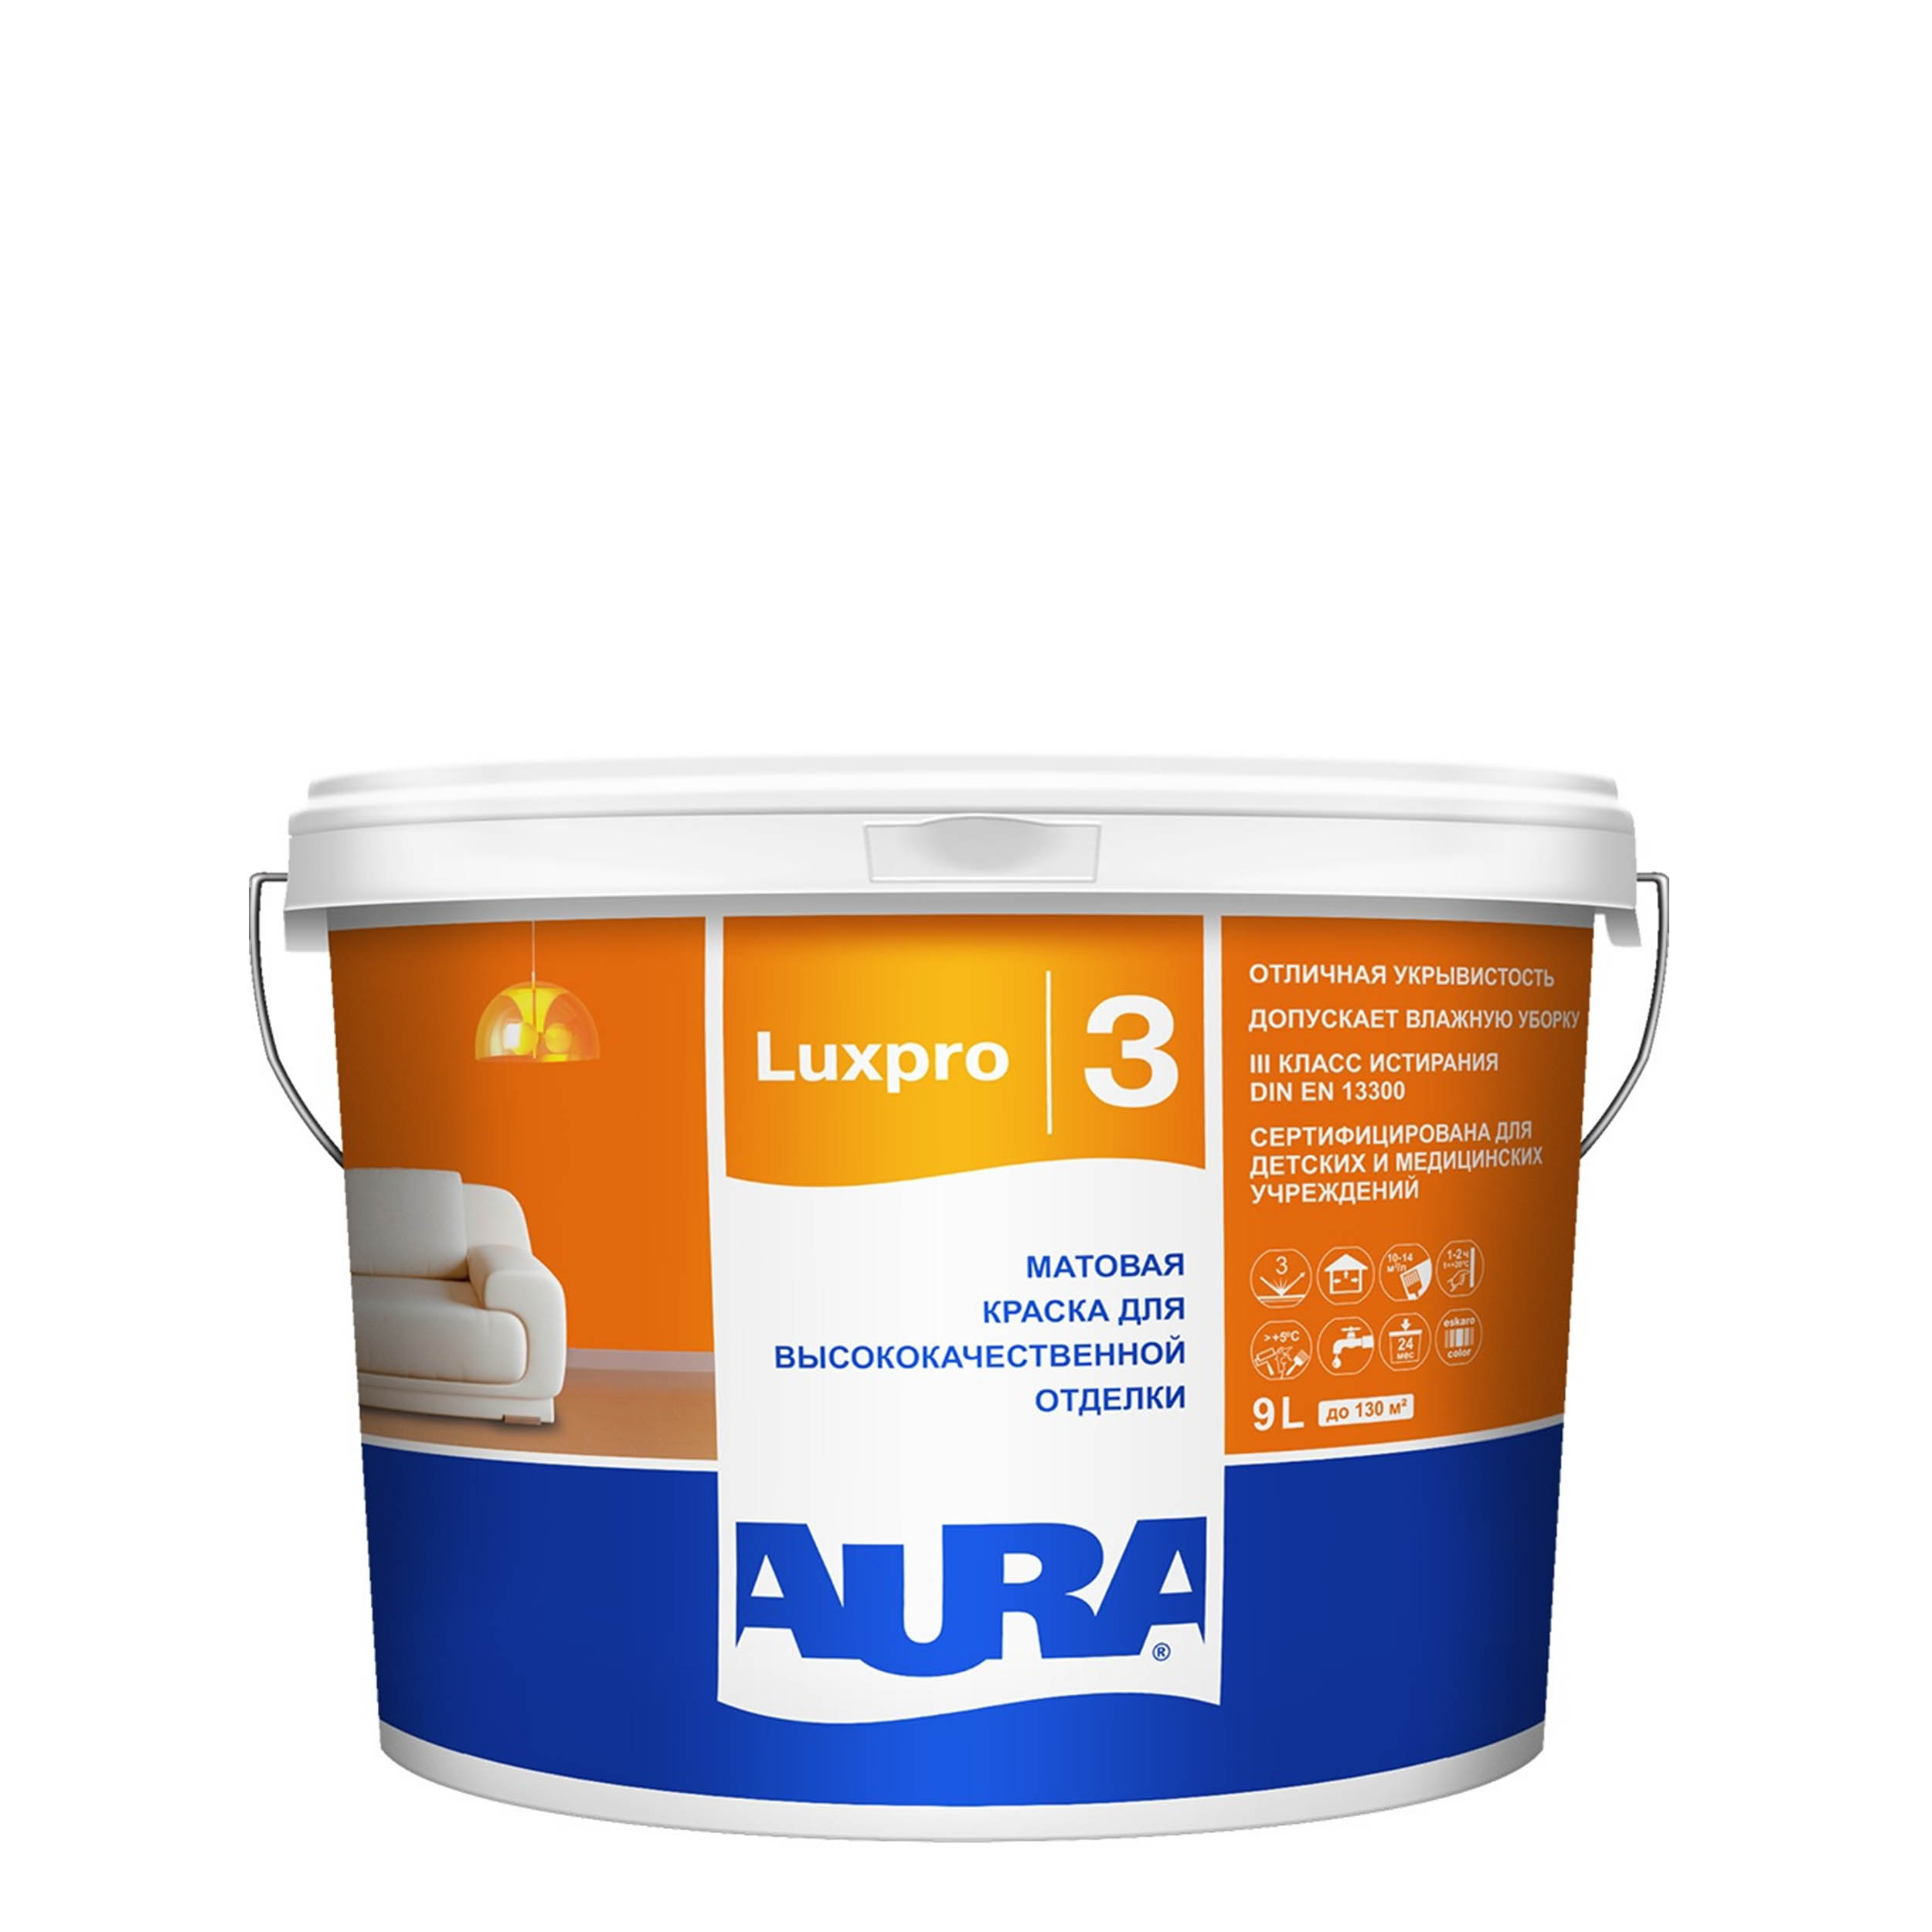 Фото 3 - Краска интерьерная, Aura LuxPRO 3, RAL 3004, 11 кг.